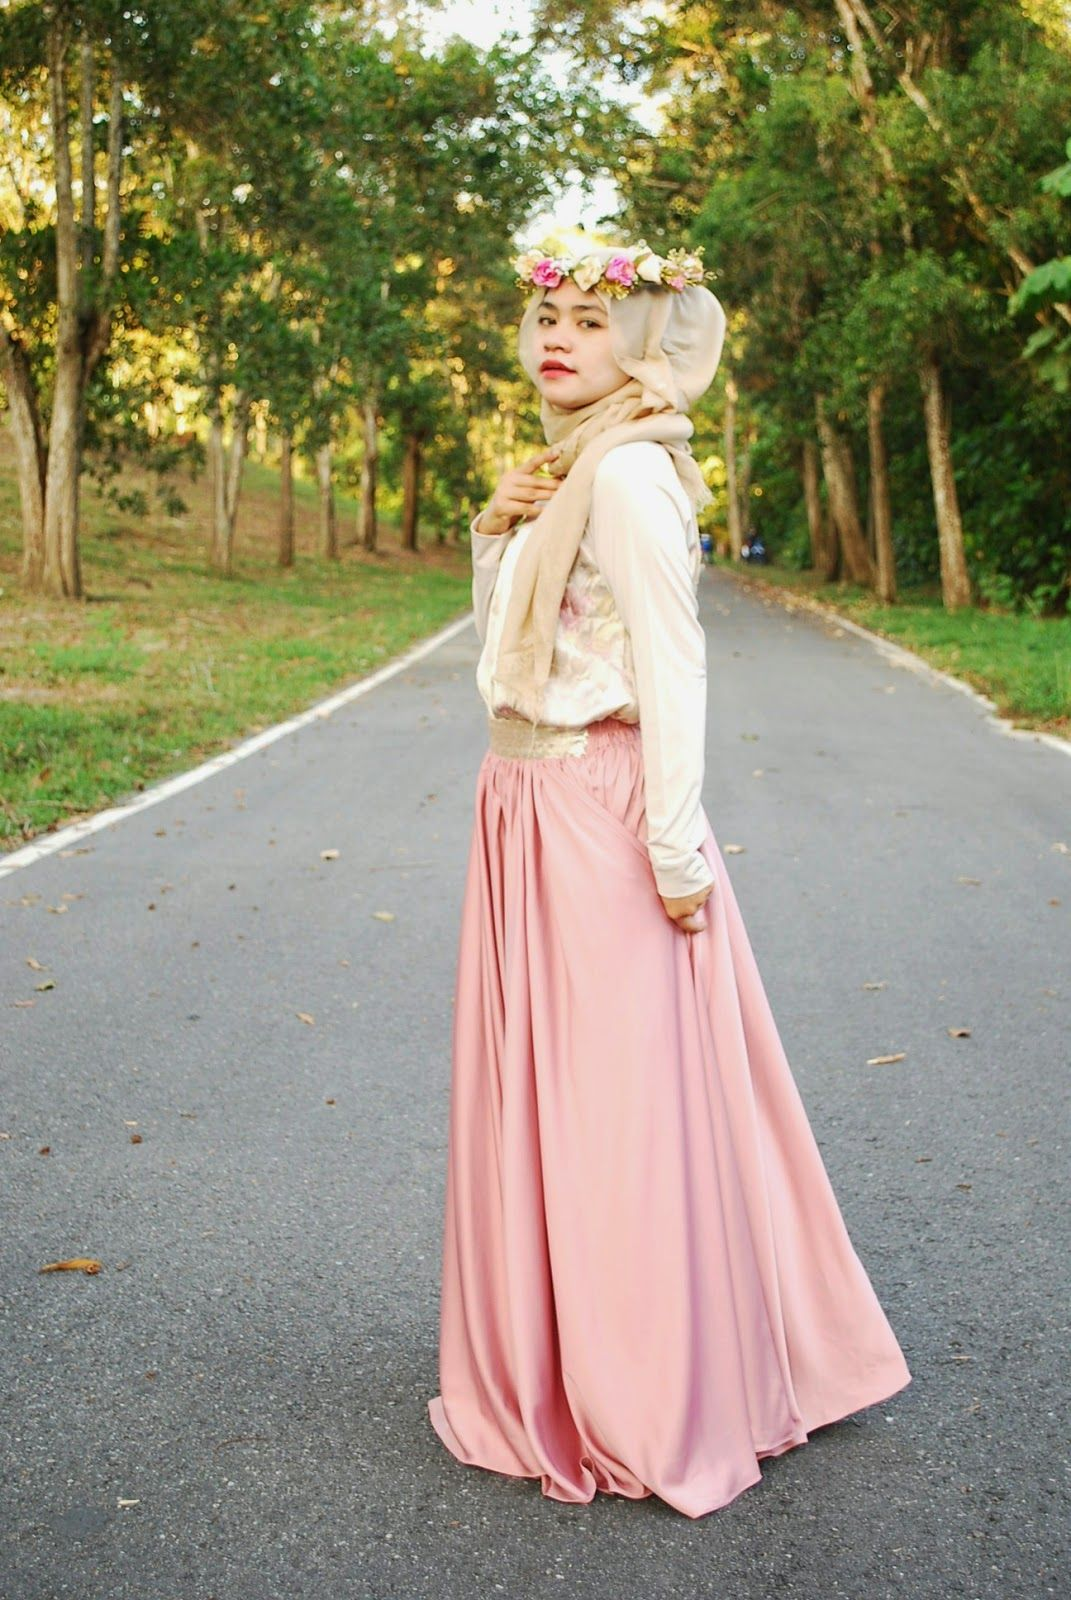 My secret imagination the jungle princess and her crown hijabi